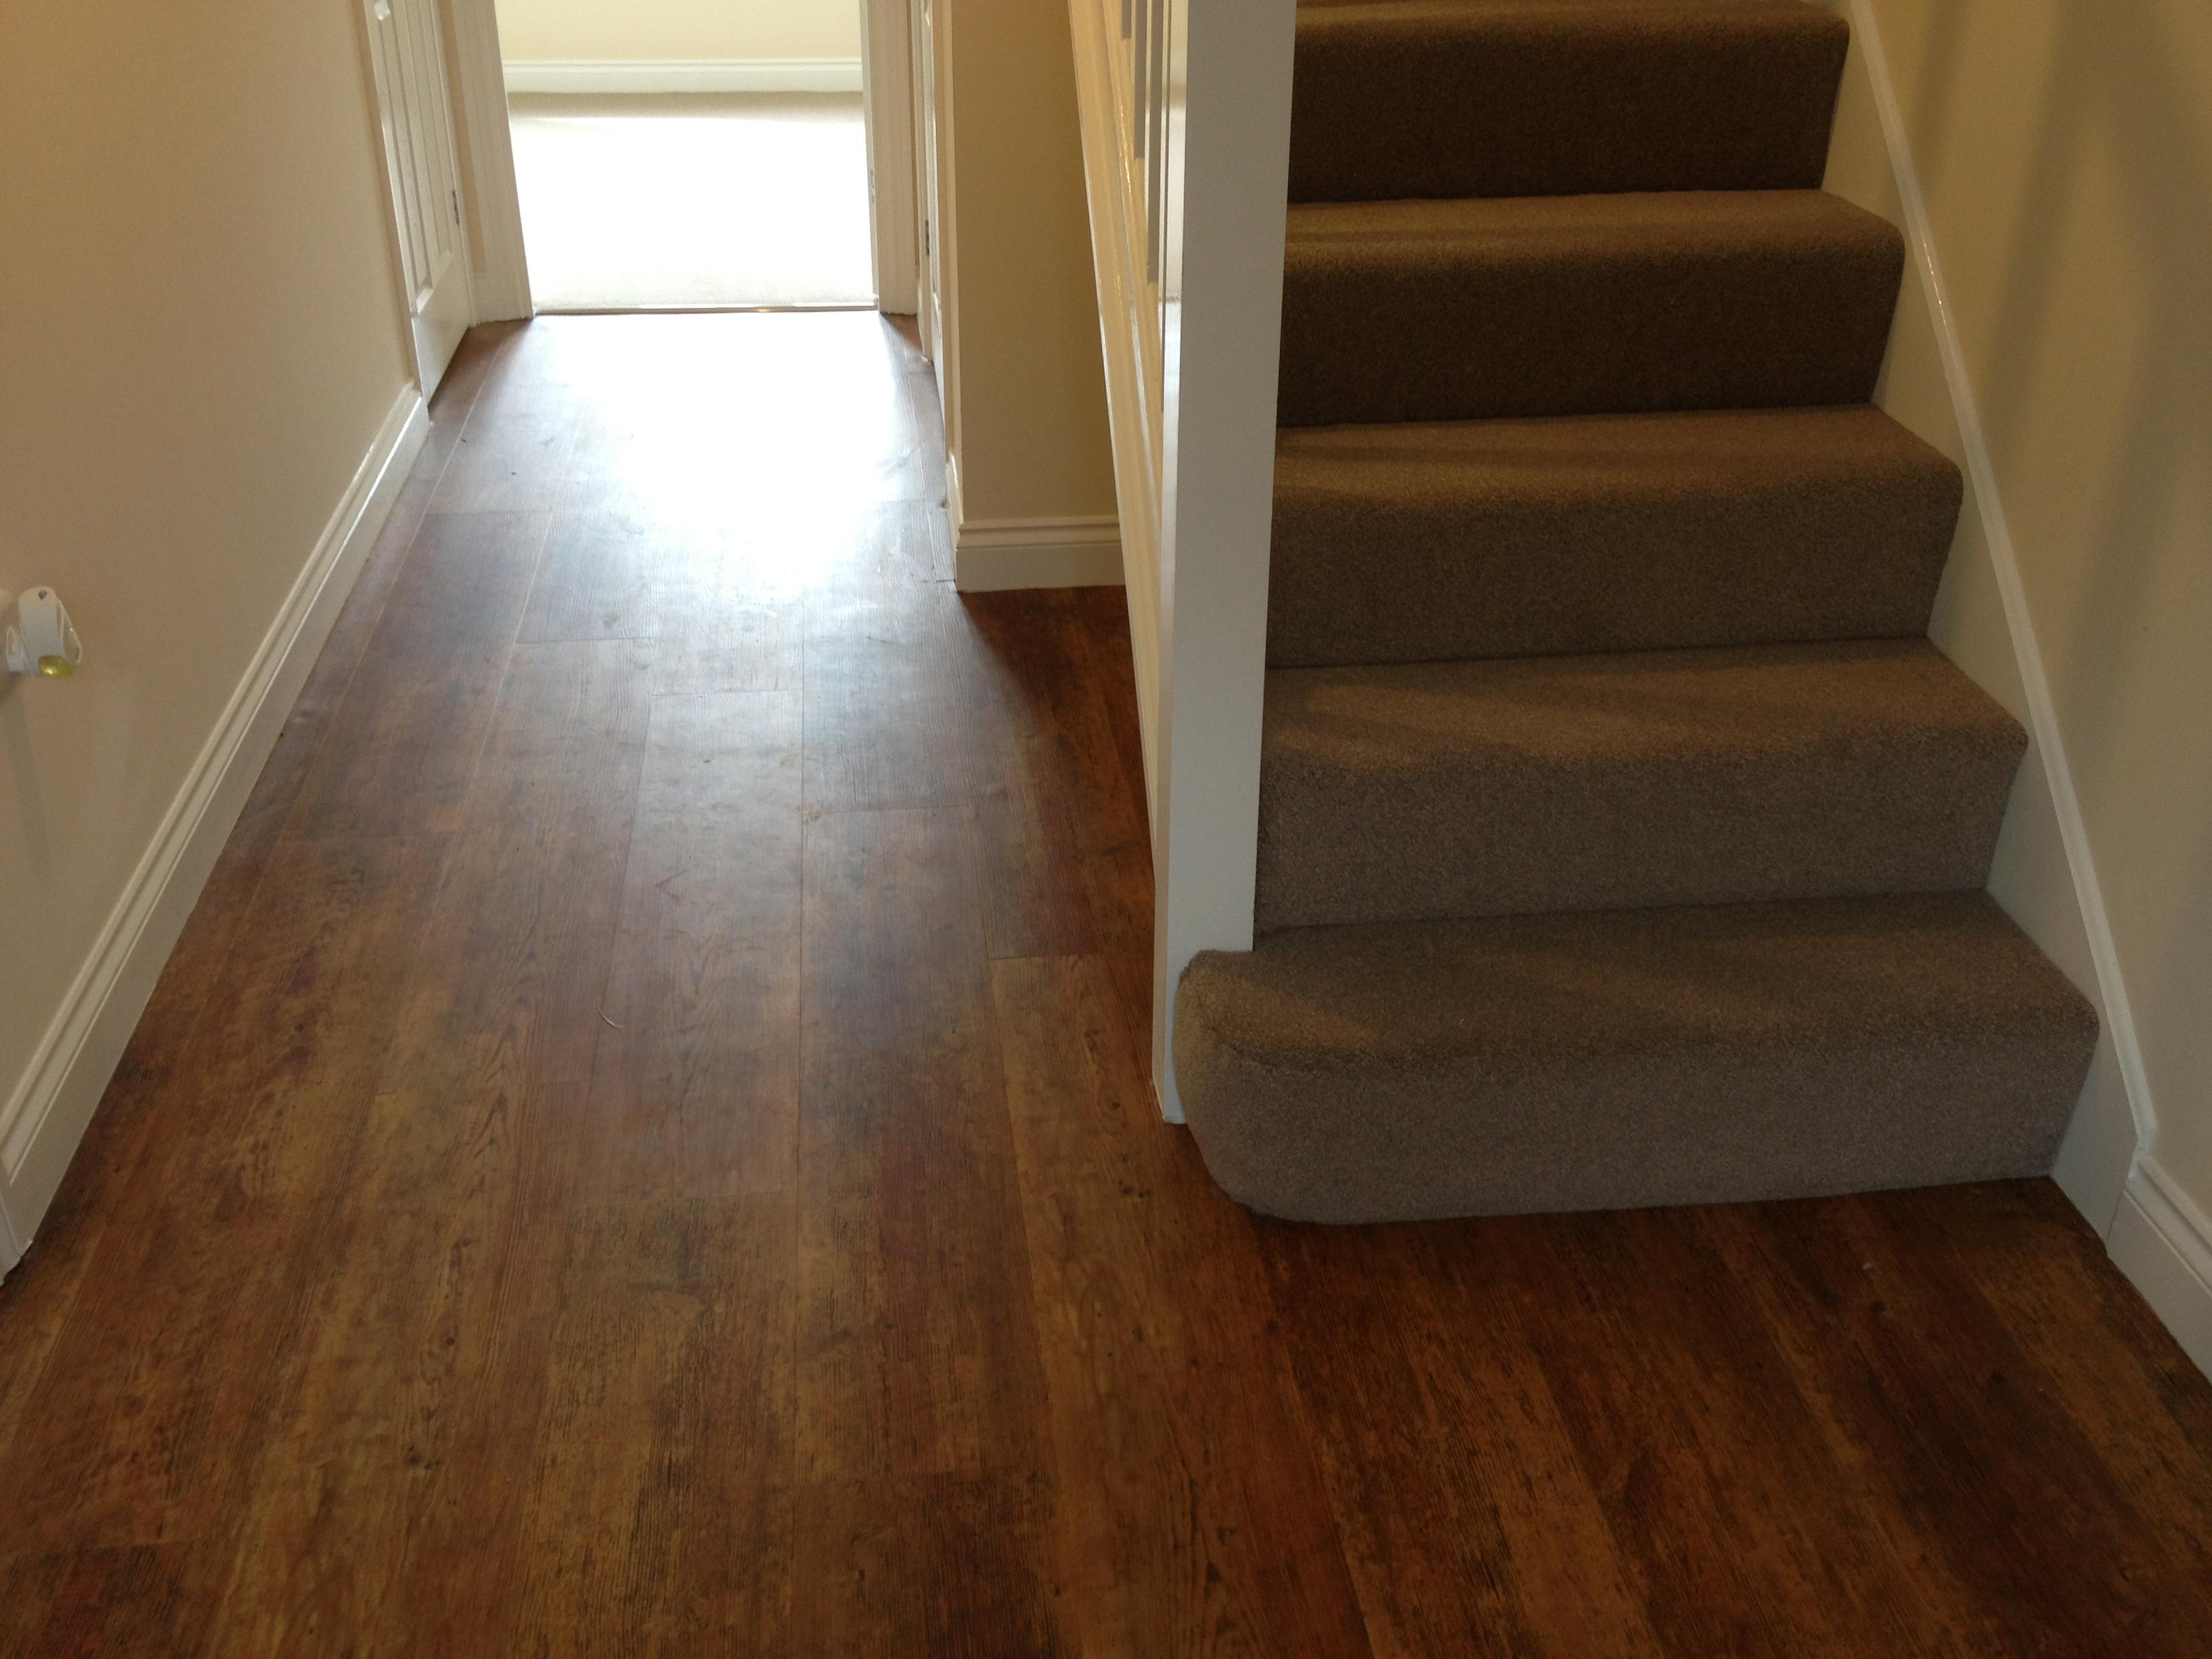 Hall wooden flooring